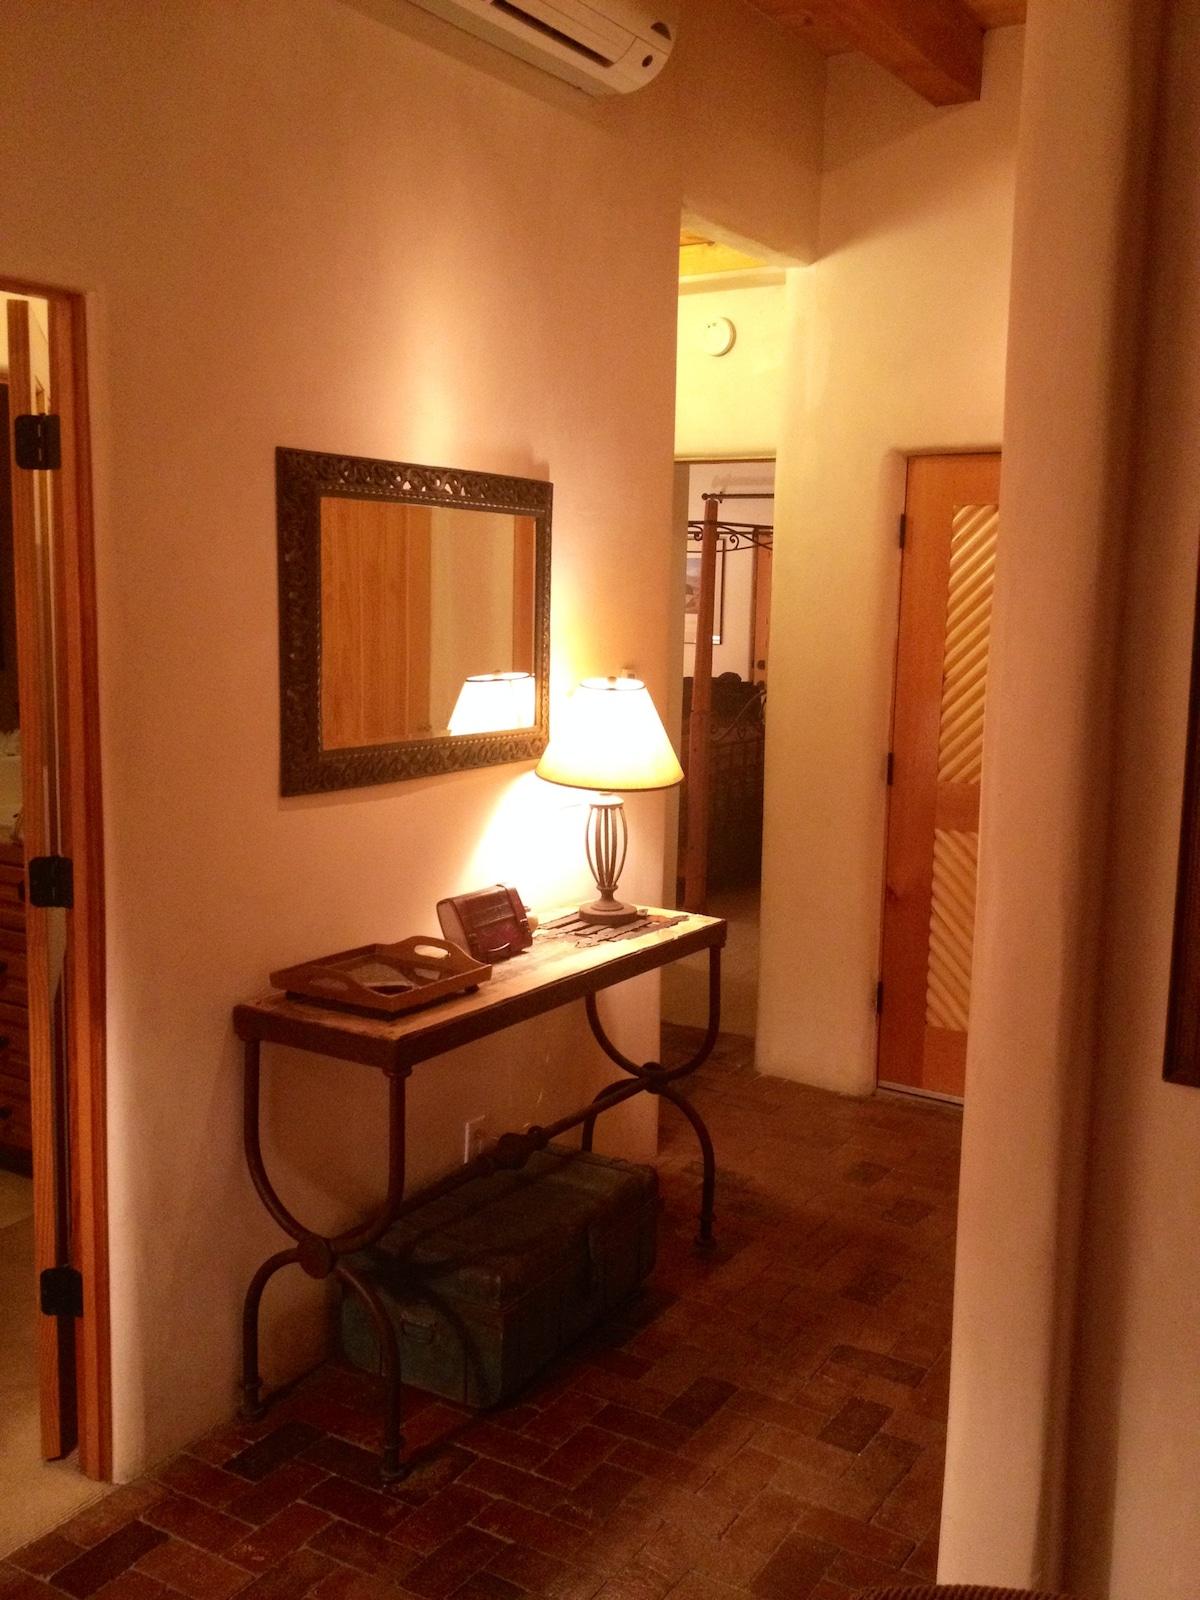 Hall between bedrooms with guest book, air conditioner, and front door